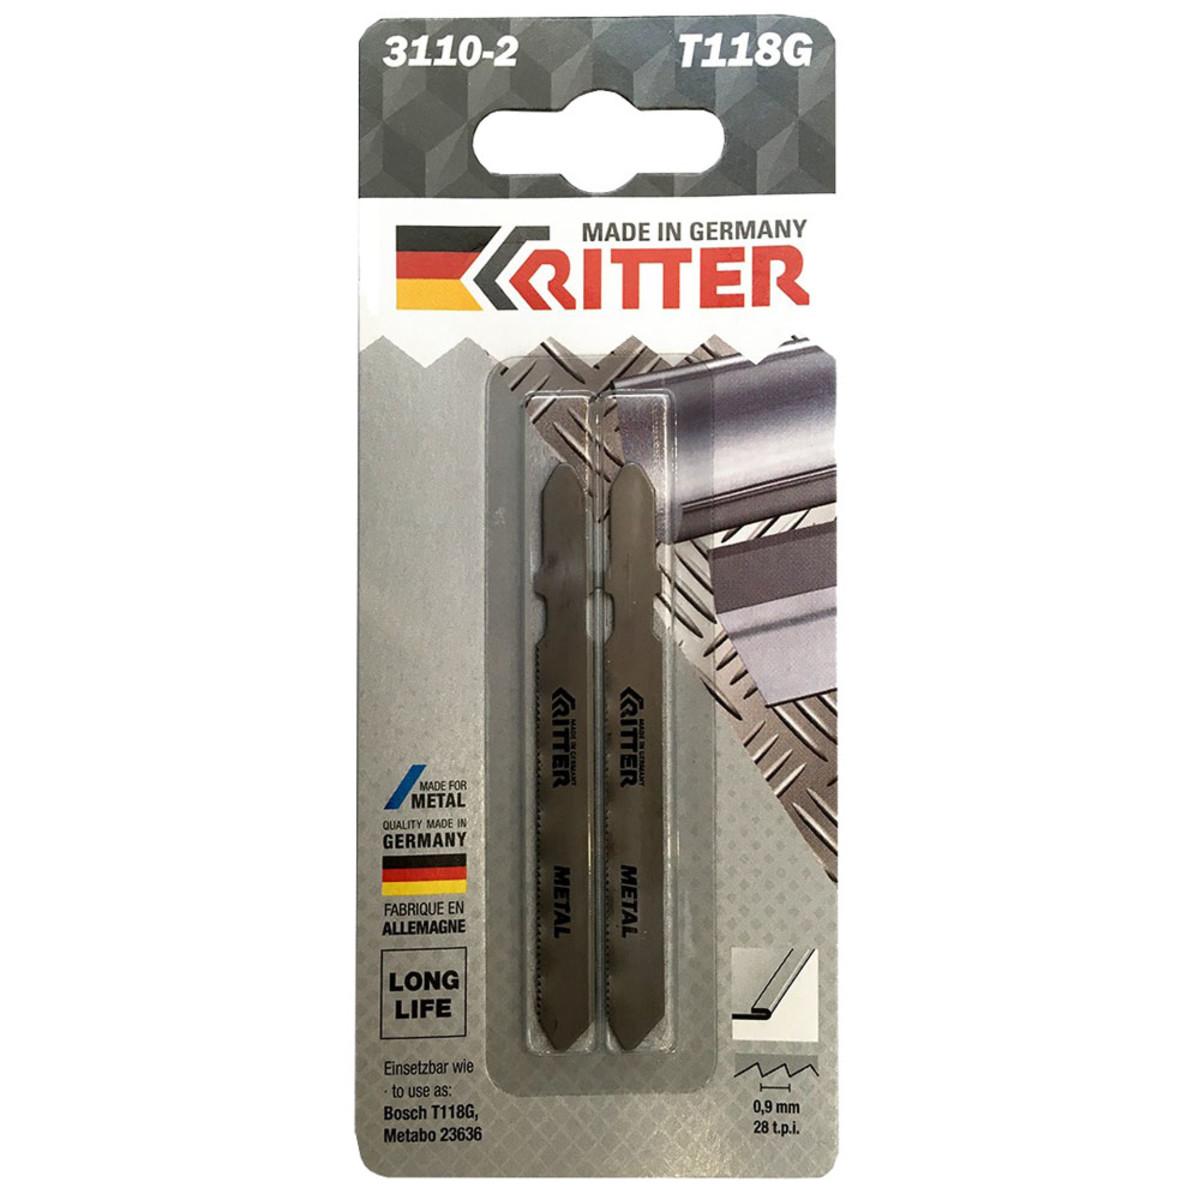 Пилки для лобзиков Ritter по стали Т118G HSS 75/50мм шаг 0.9 мм 28TPi 2 шт блистер